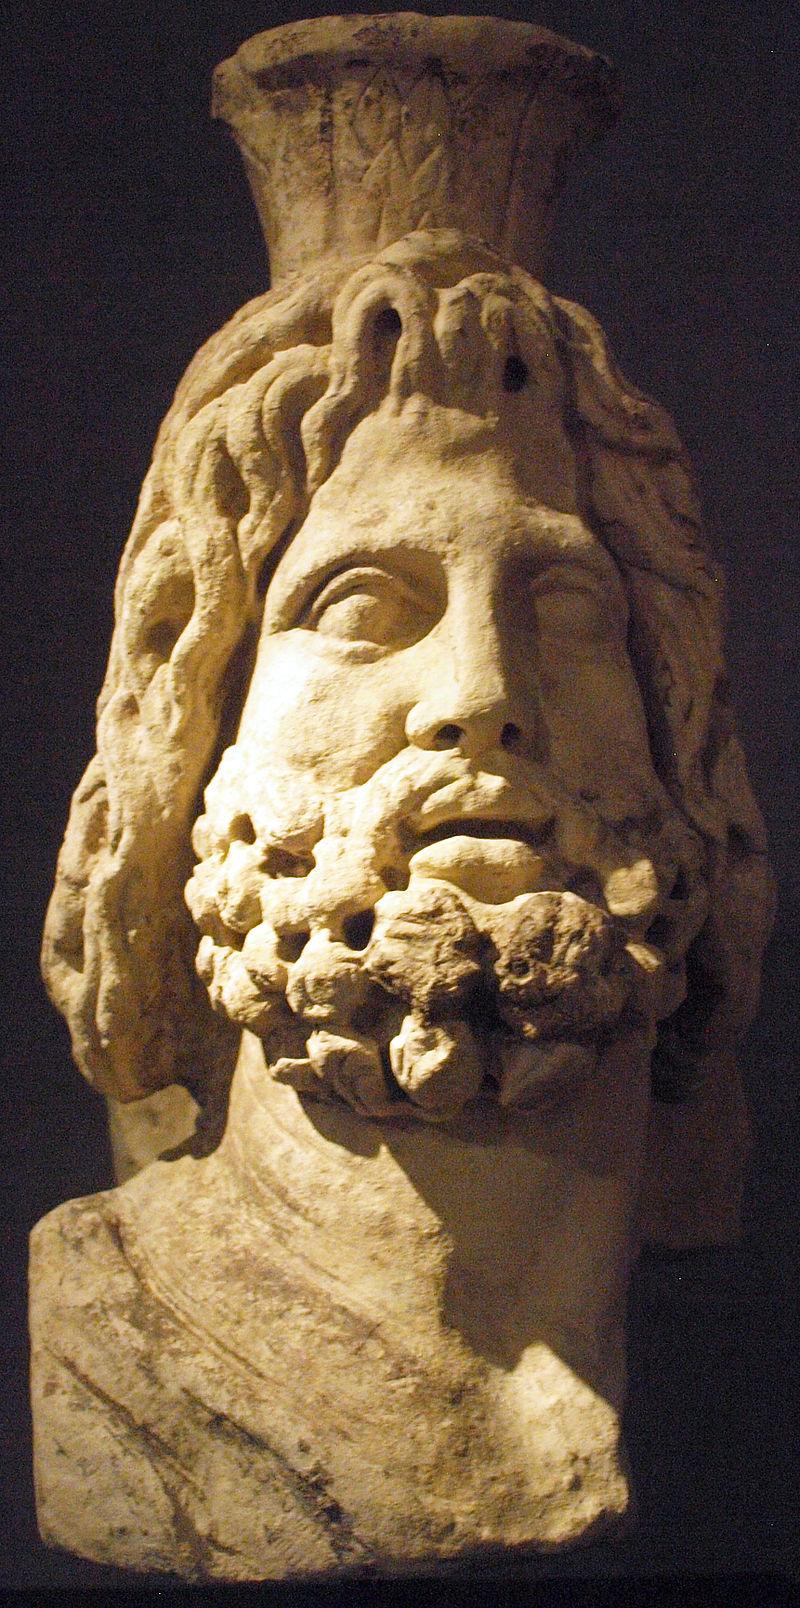 Serapis 800px-Serapis_Statue_Head_-_3rd-4th_Century_AD_-_%C3%84S_6059